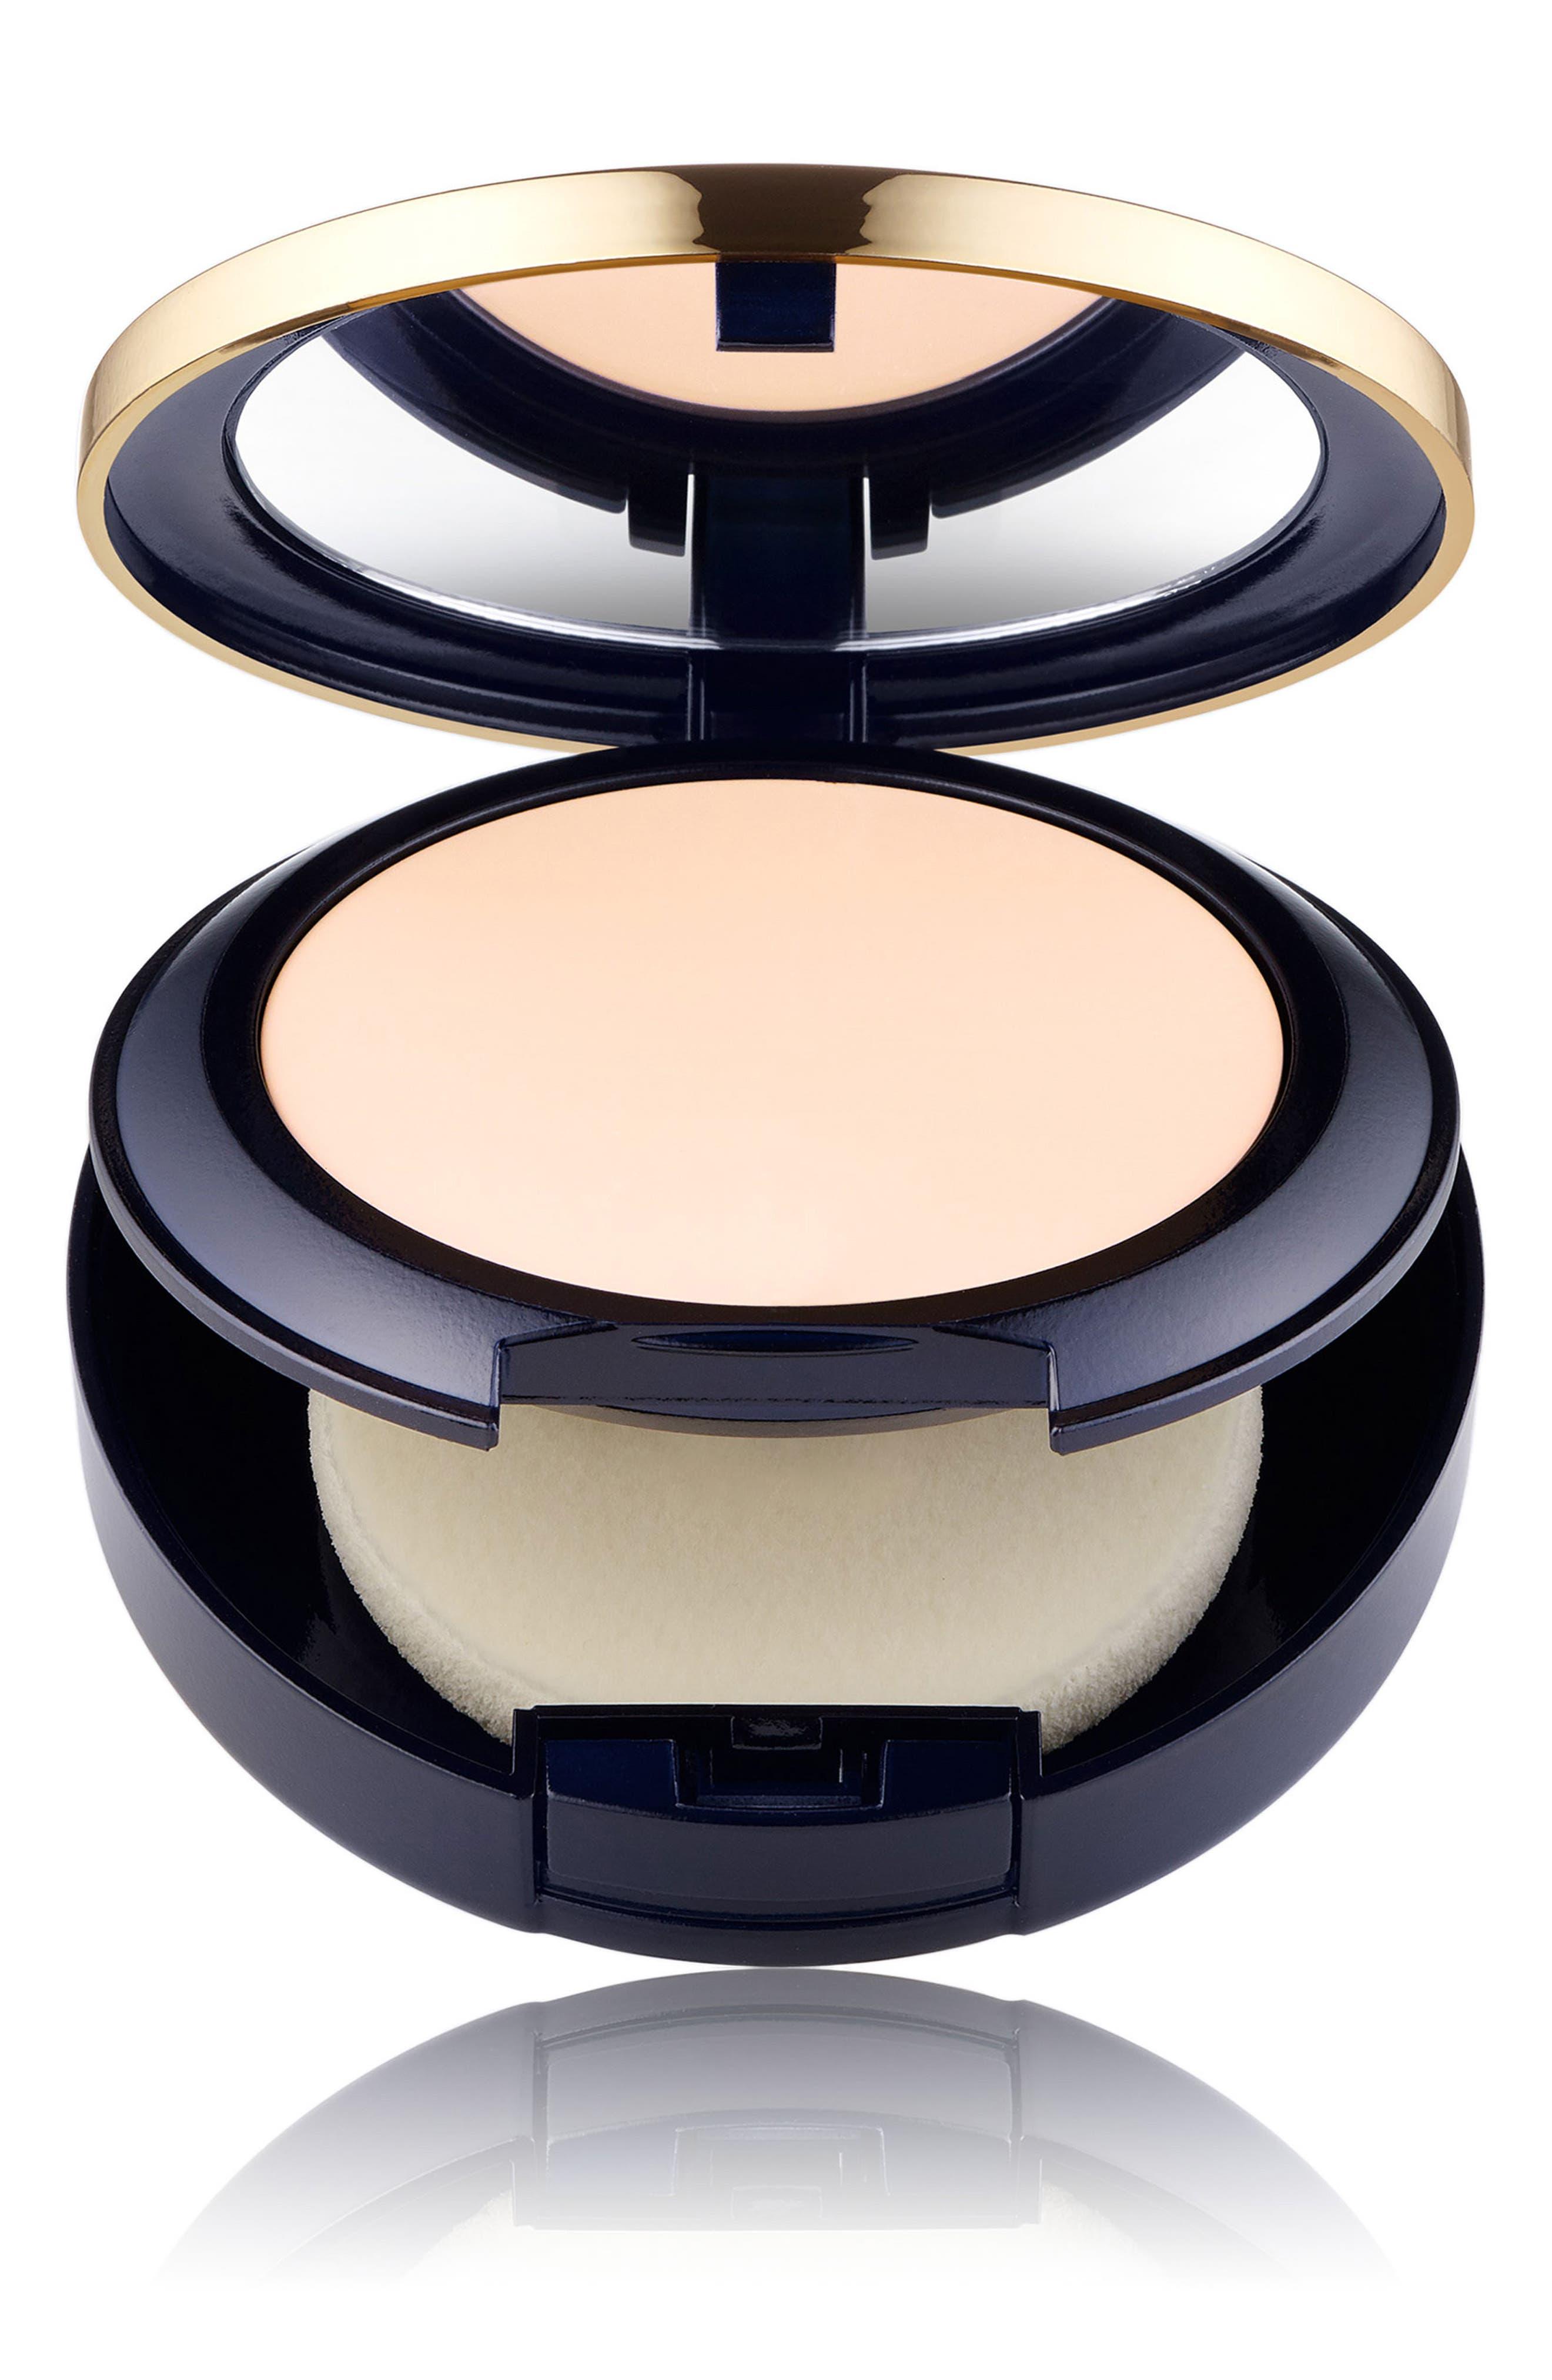 Estee Lauder Double Wear Stay In Place Matte Powder Foundation - 1N0 Porcelain